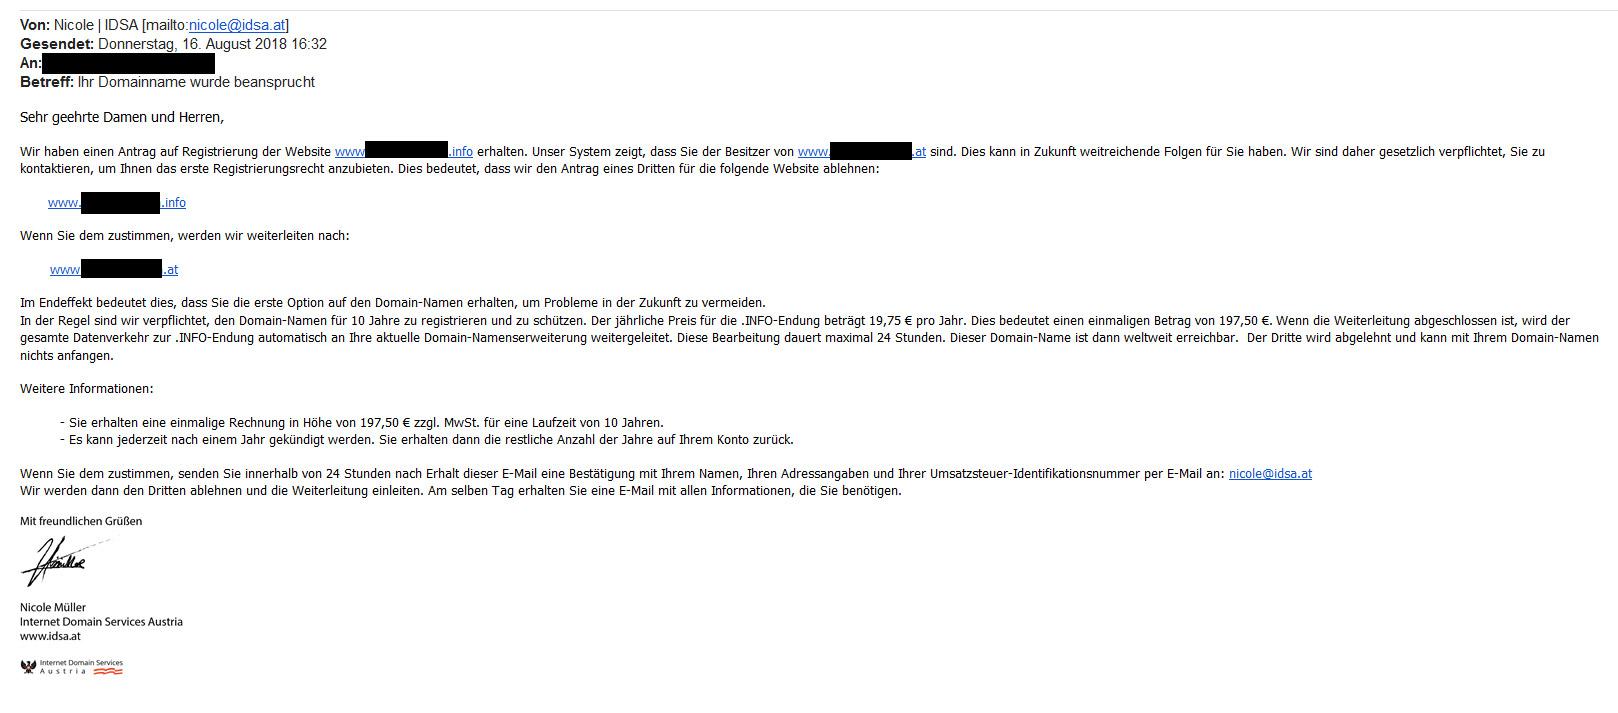 dubiosen E-Mail von Internet Domain Services Austria